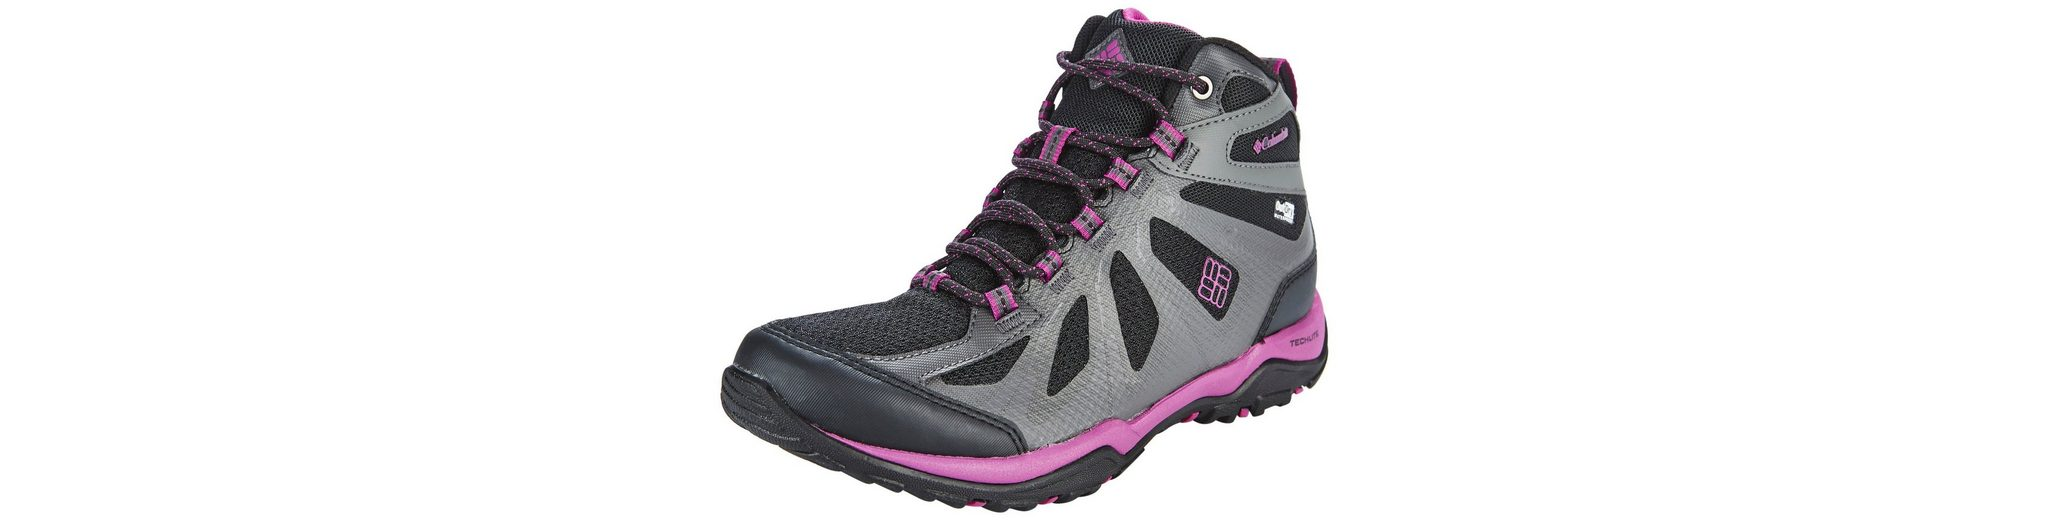 2018 Unisex Columbia Kletterschuh Peakfreak XCRSN II XCEL Shoes Women Mid OutDry Online Einkaufen lakMQsxSZ